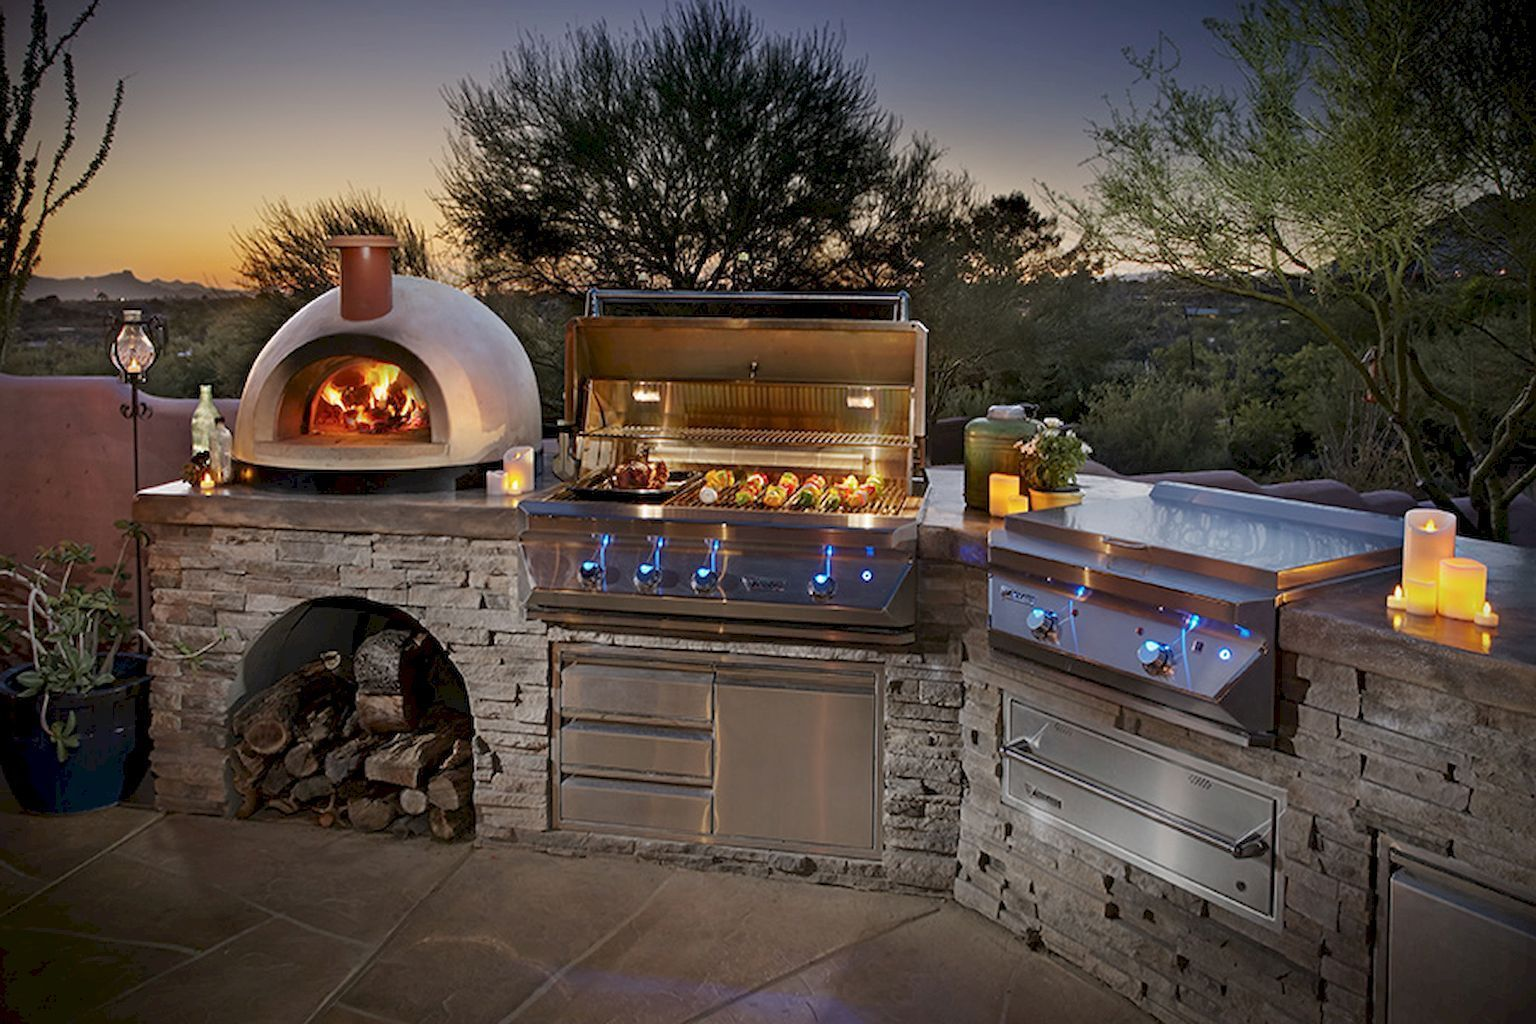 outdoor kitchen ideas on a budget 44 outdoor kitchen design backyard kitchen pizza oven on outdoor kitchen ideas on a budget id=61080